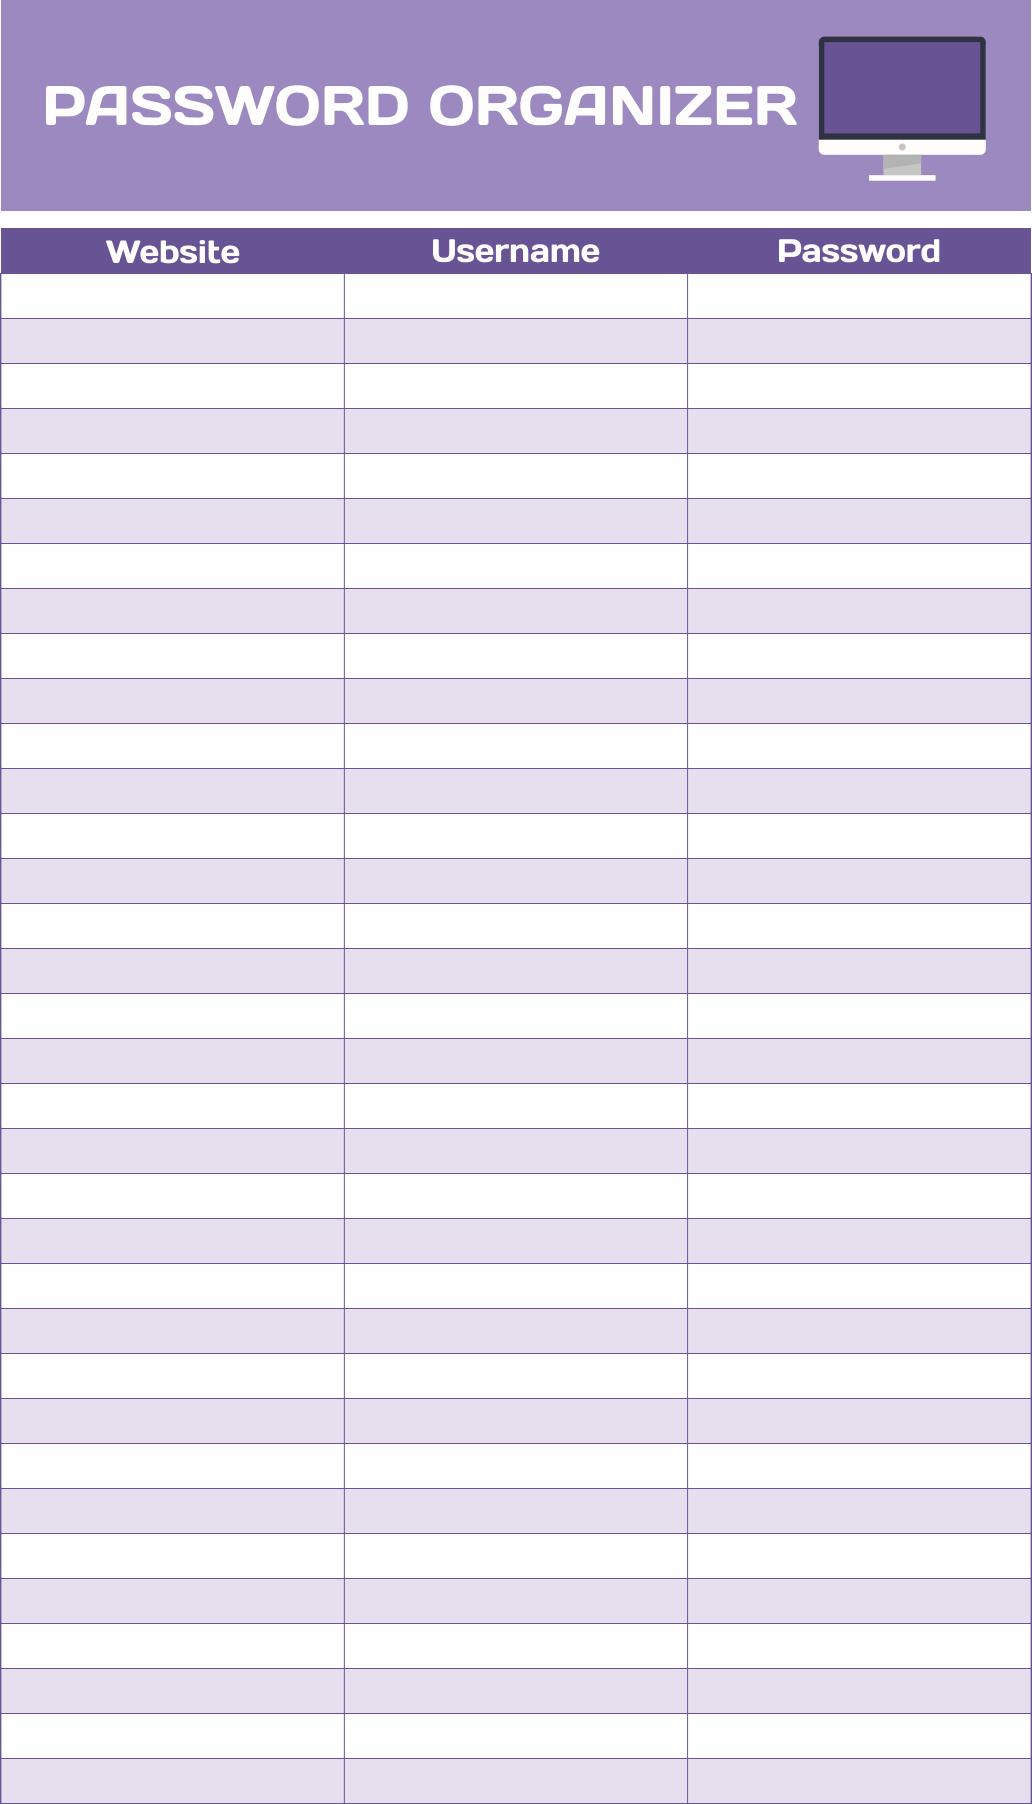 Printable Password Organizer Template